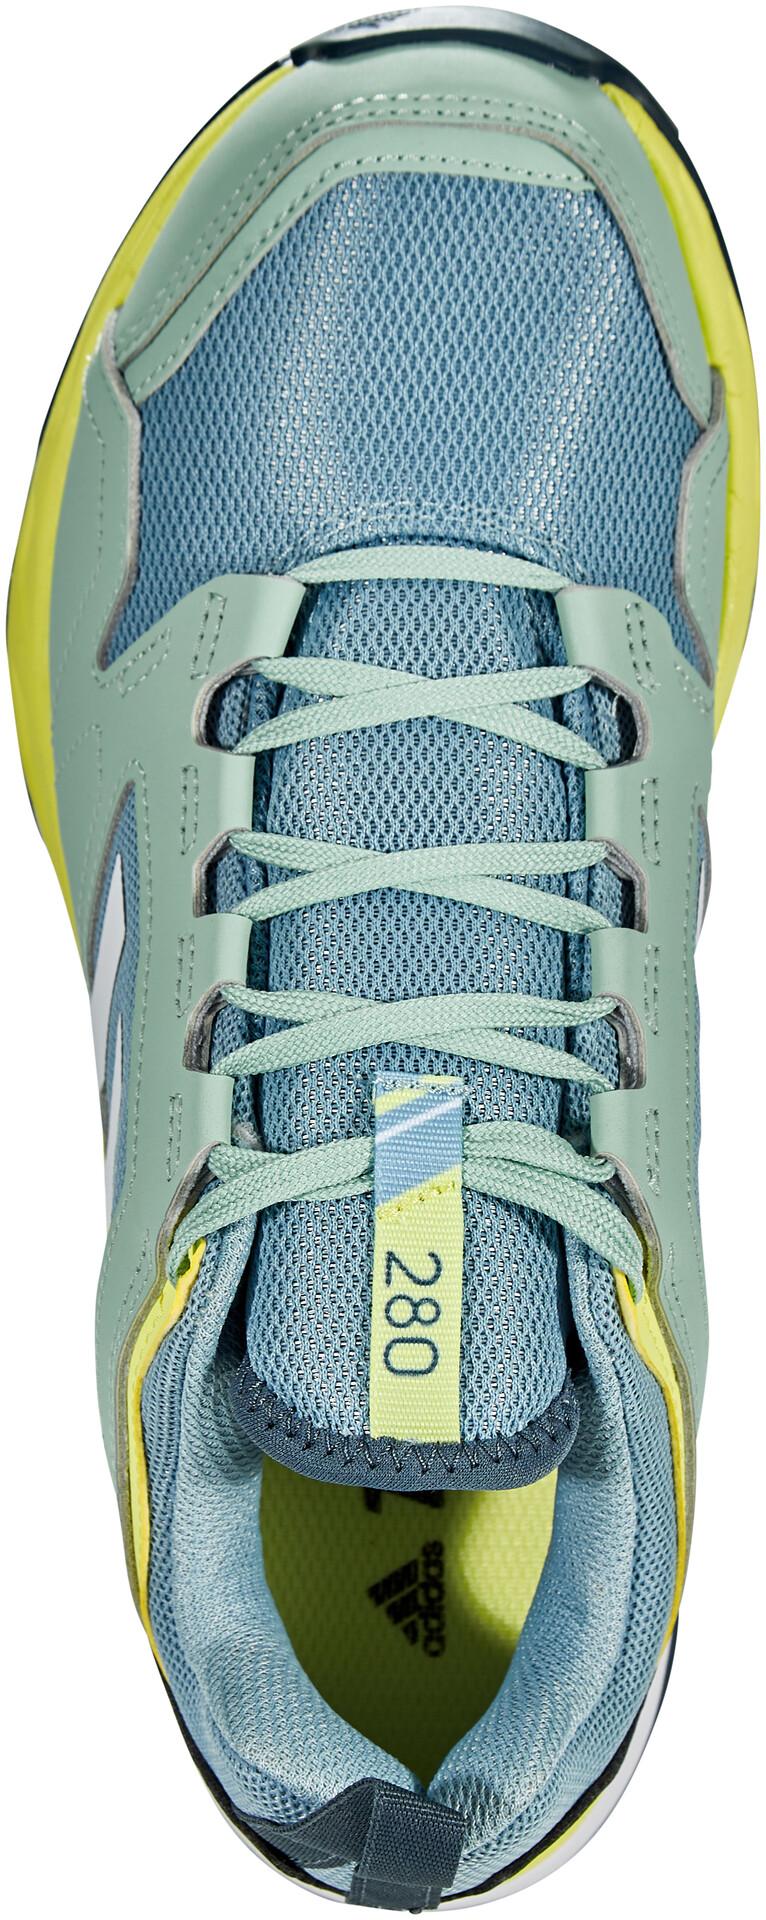 adidas TERREX Agravic TR Scarpe da trail running Donna, ash greyfootwear whiteyellow tint